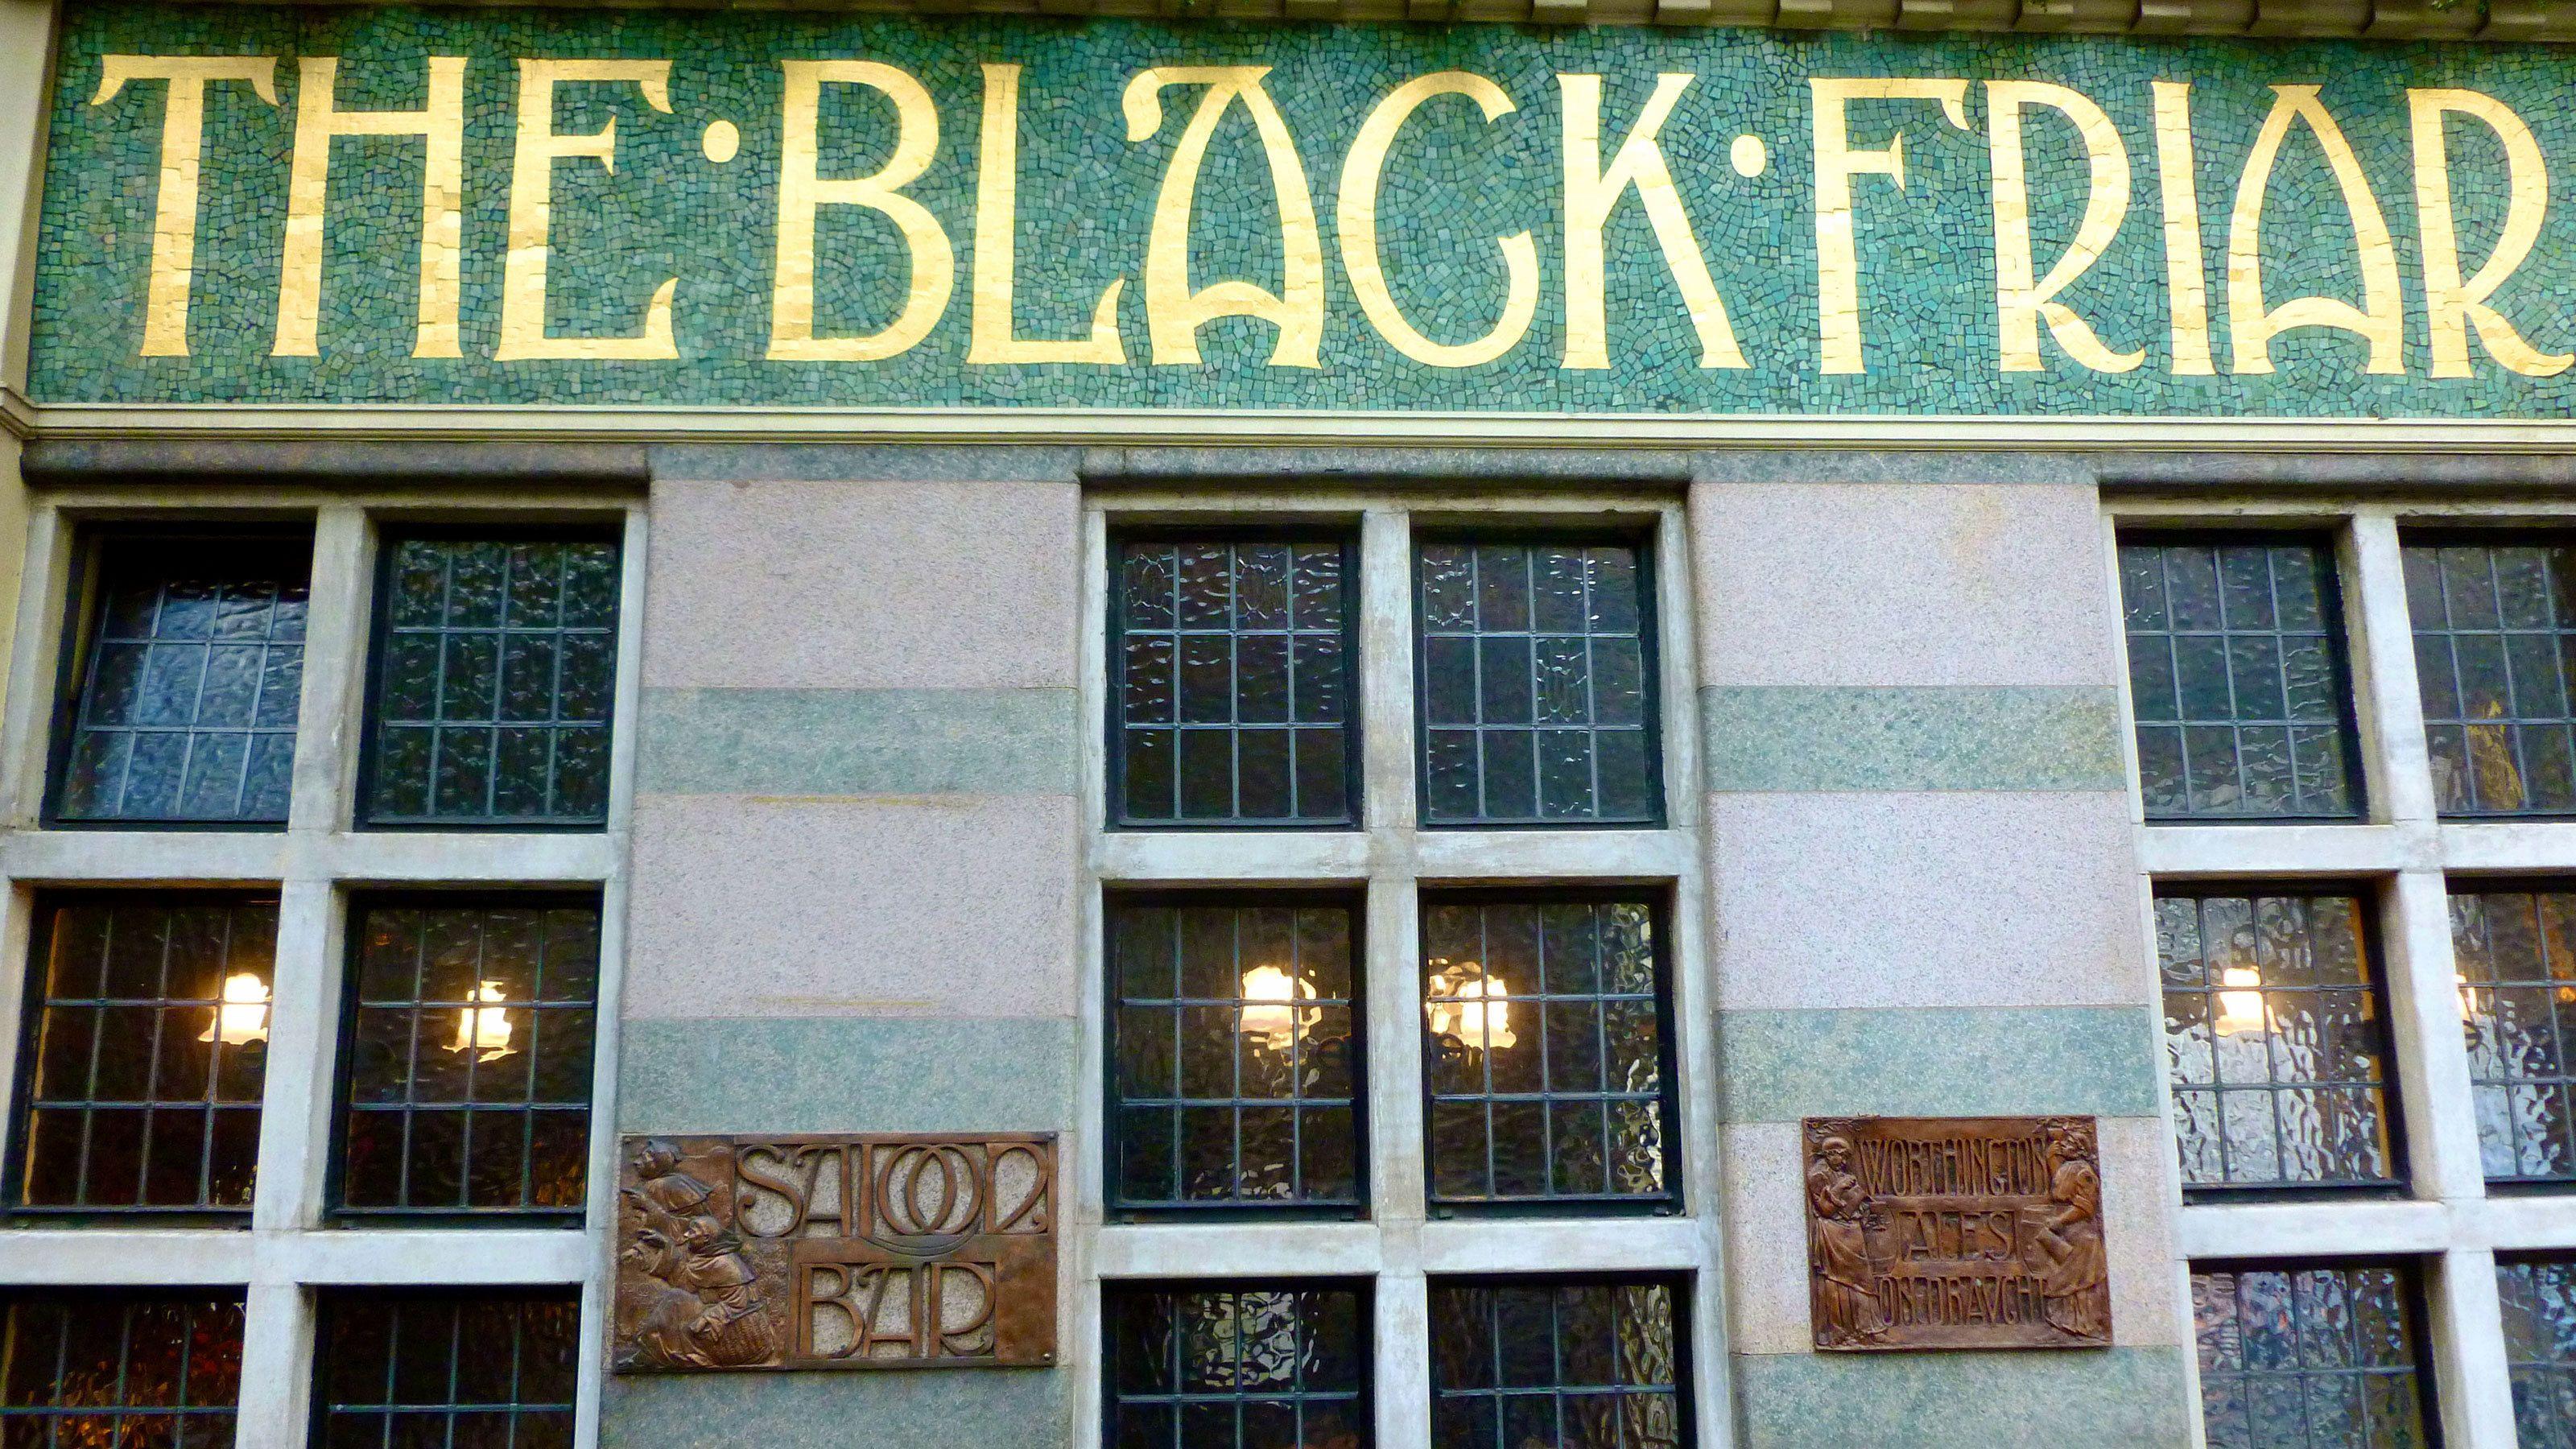 The Black Friar bar in London